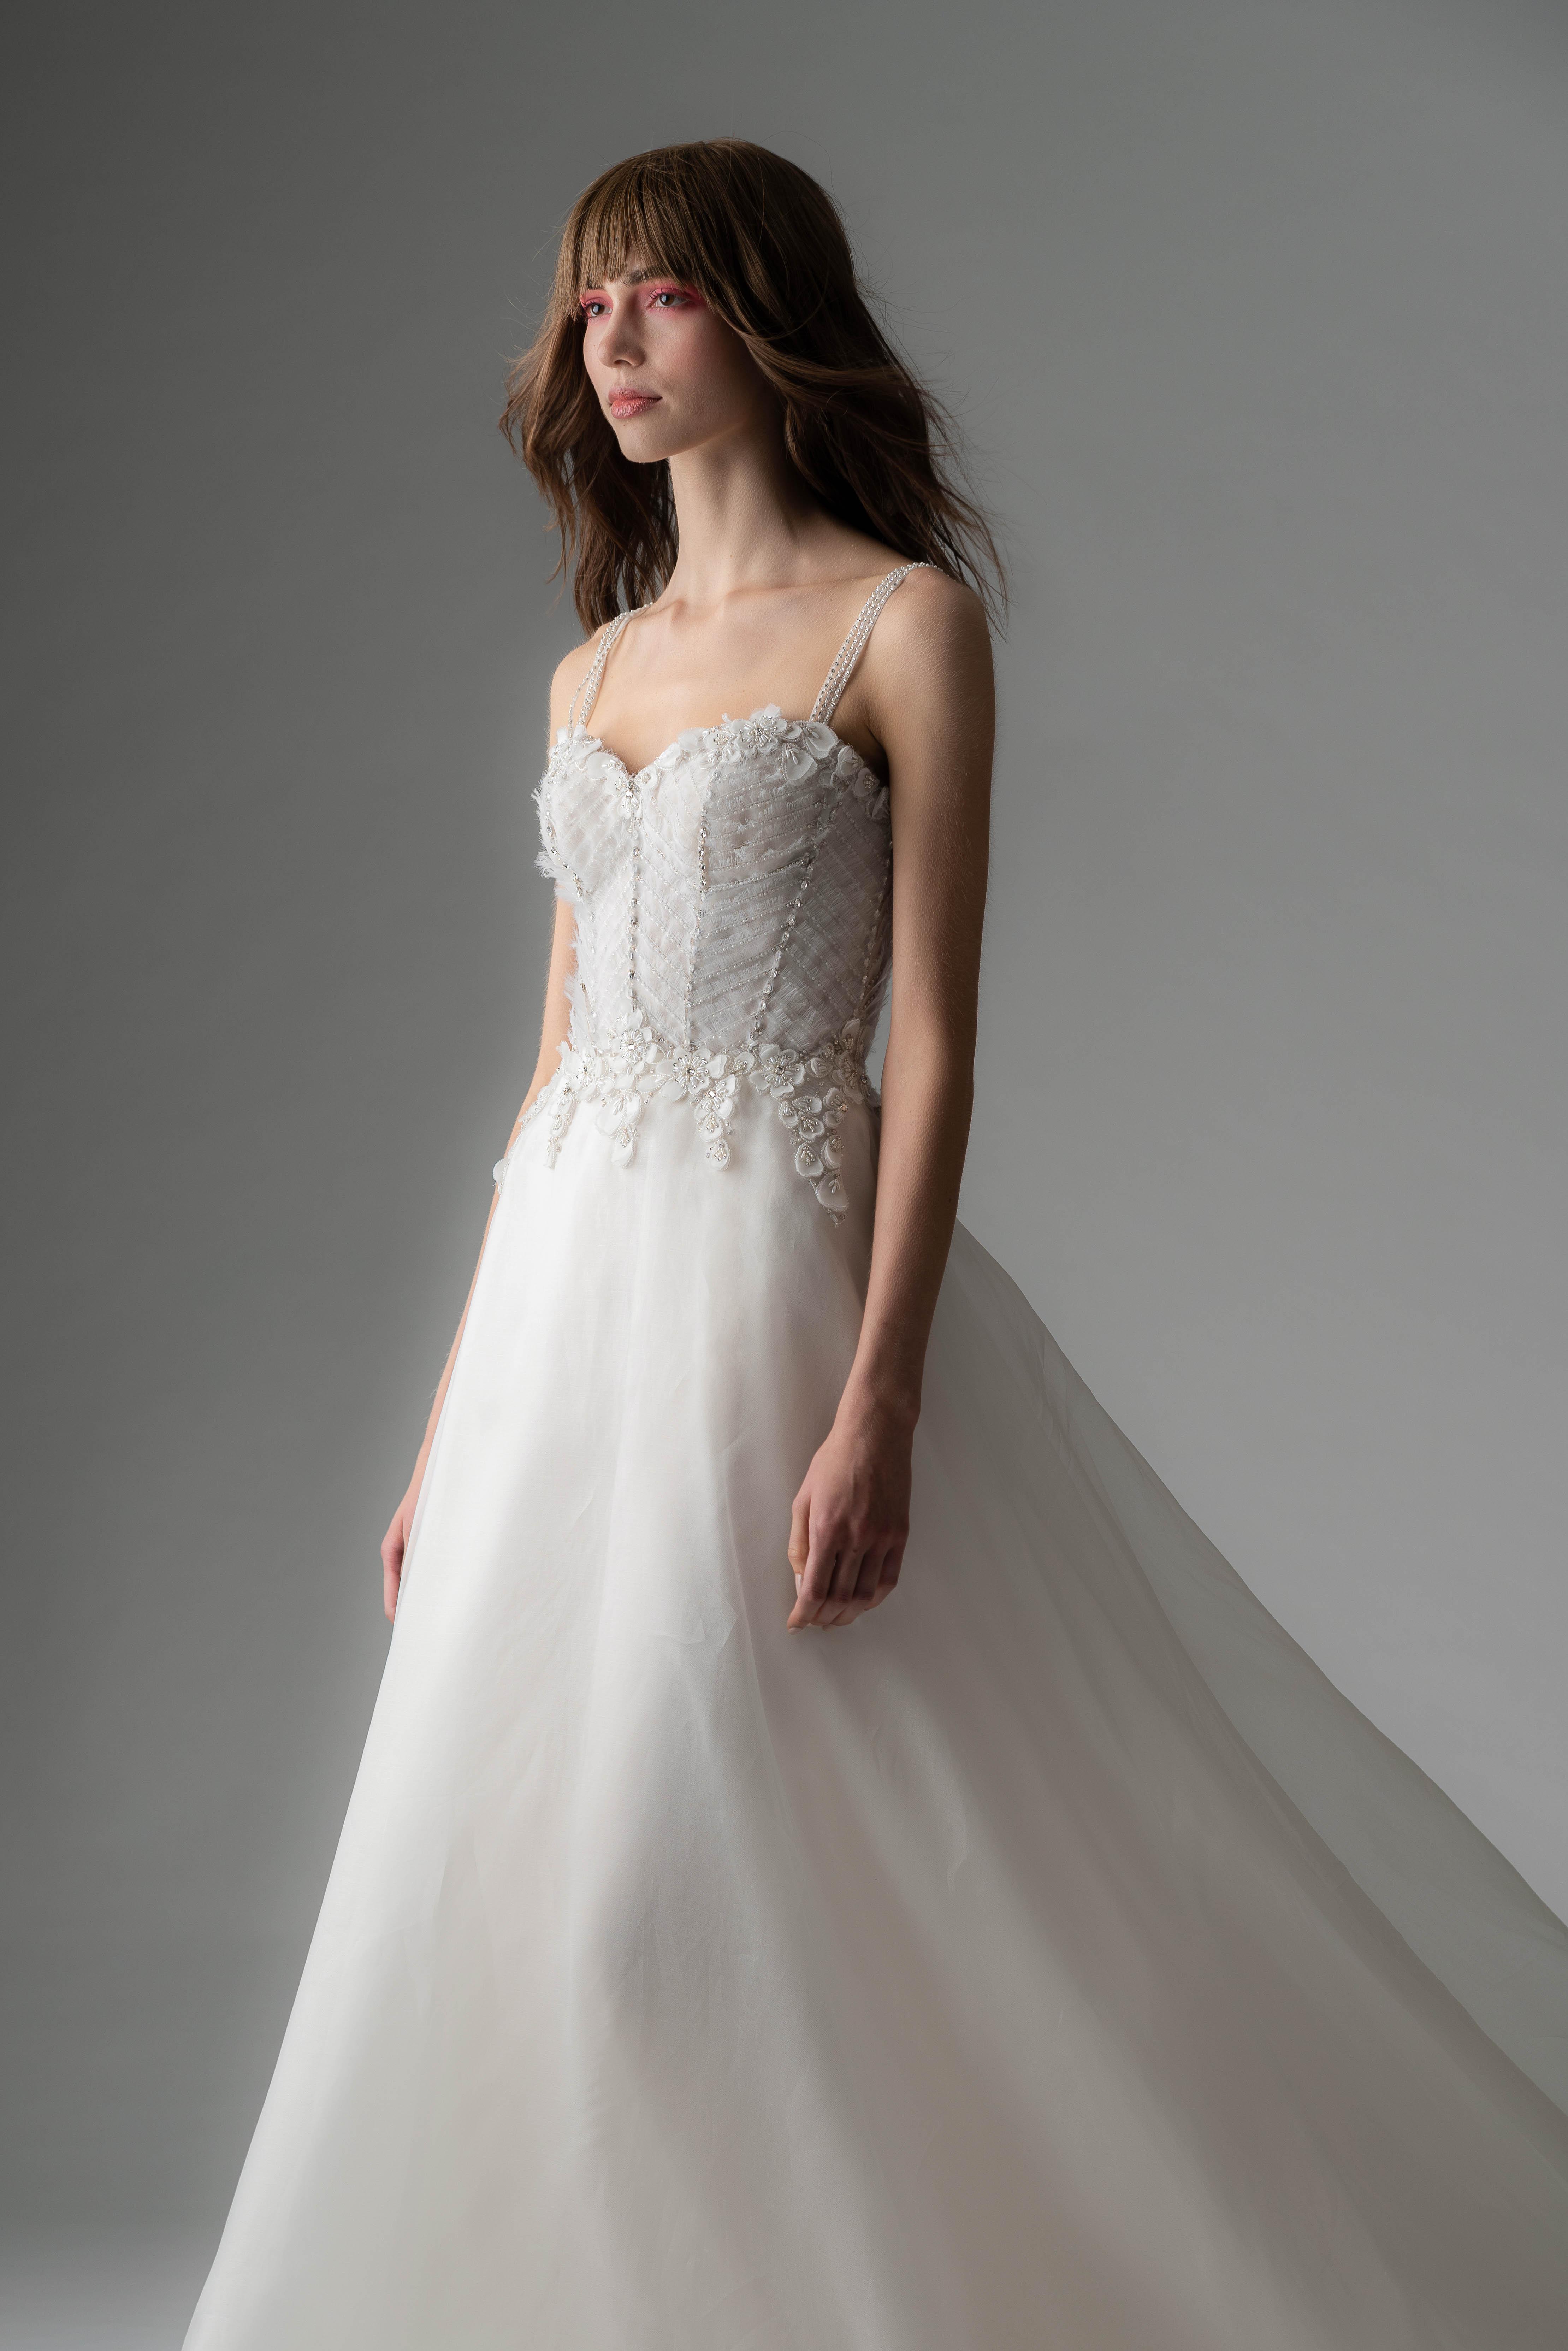 rivini by rita fall 2019 corset a-line wedding dress